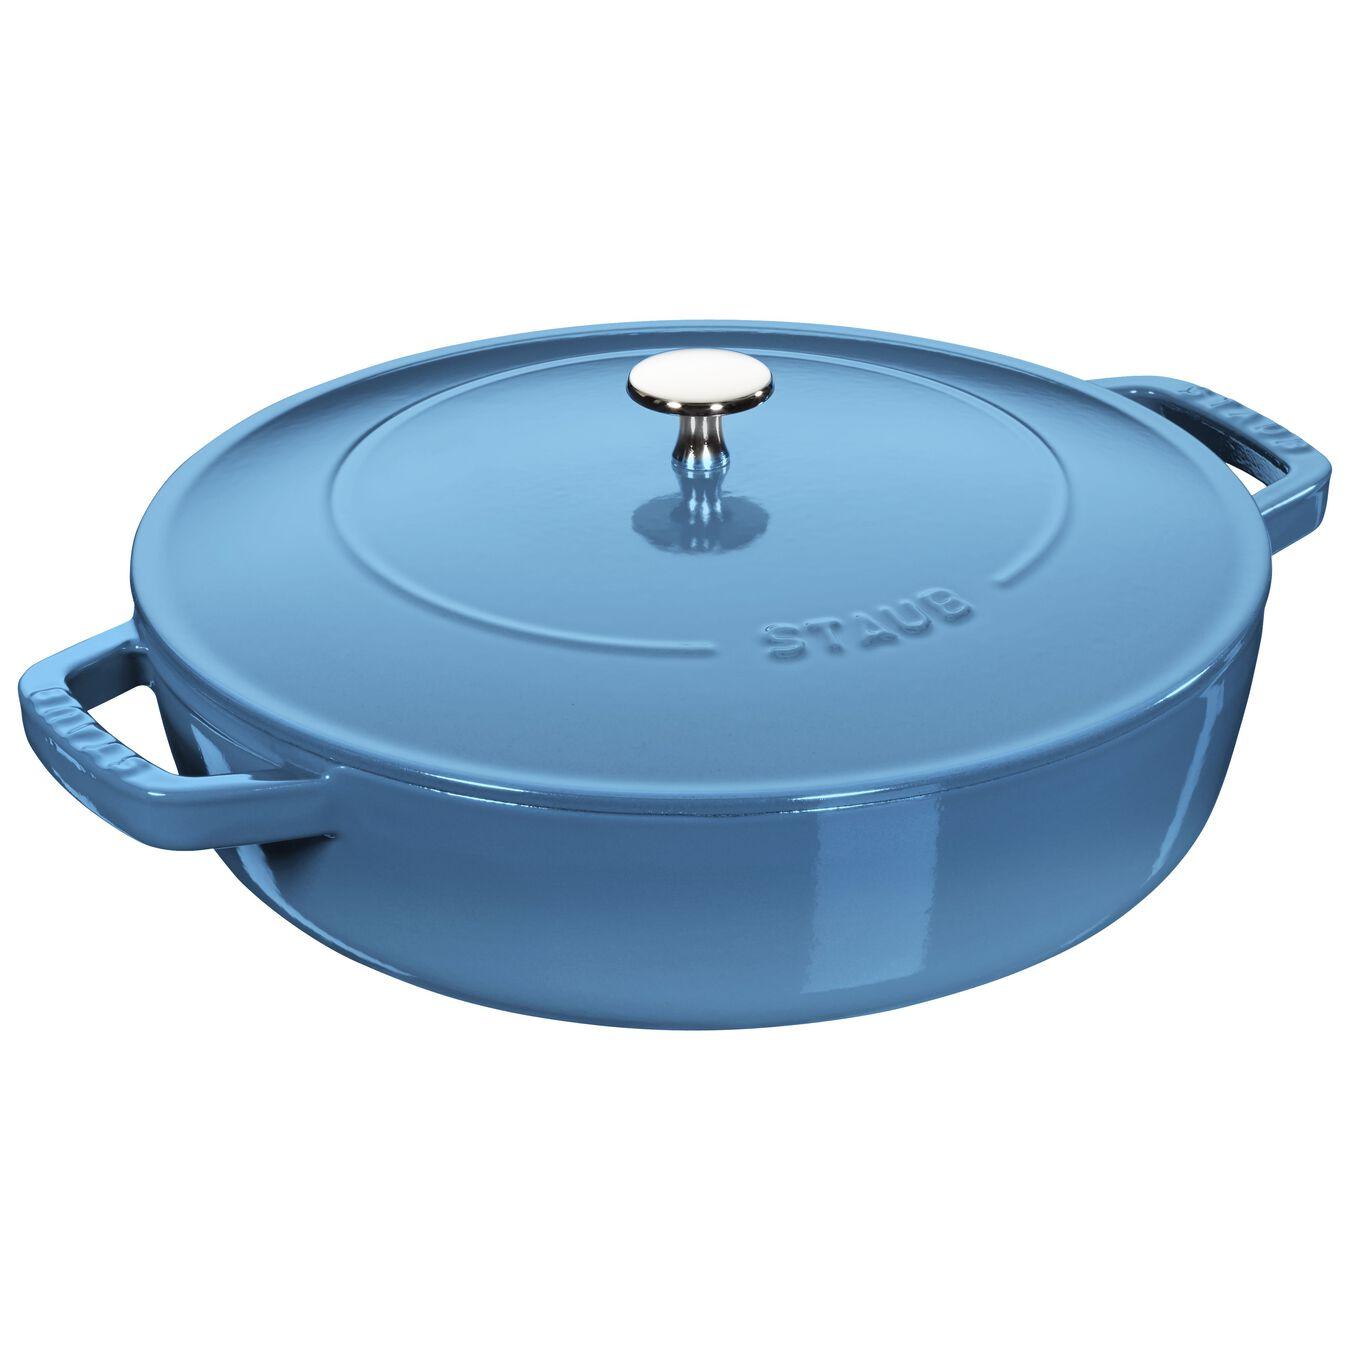 3.75 l round Saute pan Chistera, ice-blue,,large 1